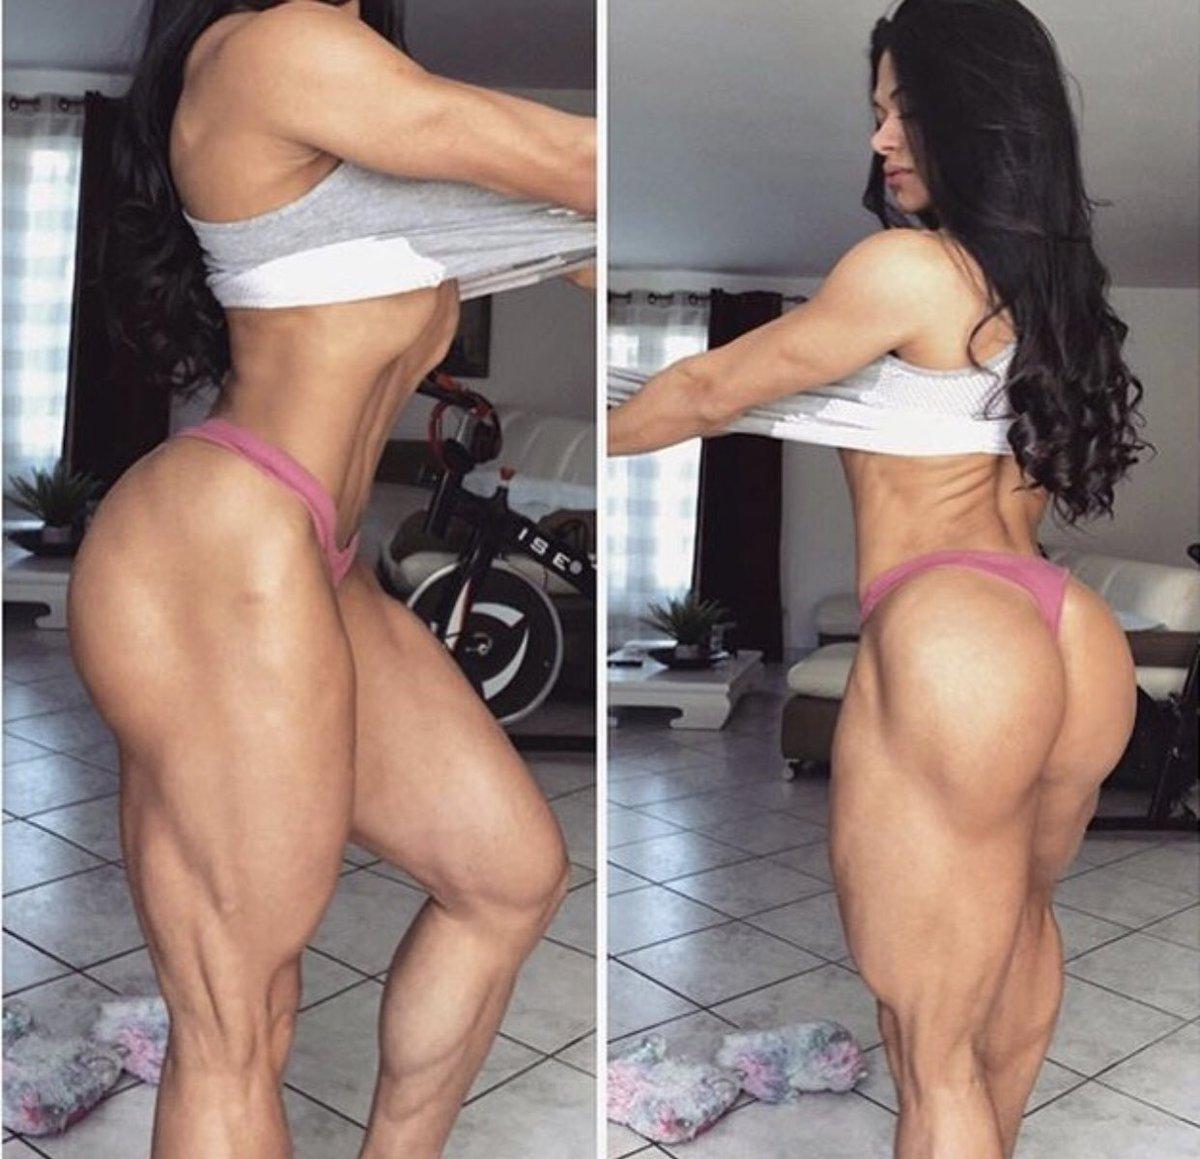 #MuscleMonday #musclewomen #bodybuilder @queenmuscle3000 @hellohotbeef @girlbeasts @FerDamCar @FemaleMuscleFa1 @Female_Muscles @musclebeauties @musclebeauties2 @TheRangeRider1 @algebramuscle @Longshotjimi1 @bighippy10 @LesGrossman3 @seriesfit @zviki100 @FBBSEXY @luvmuscularbabe